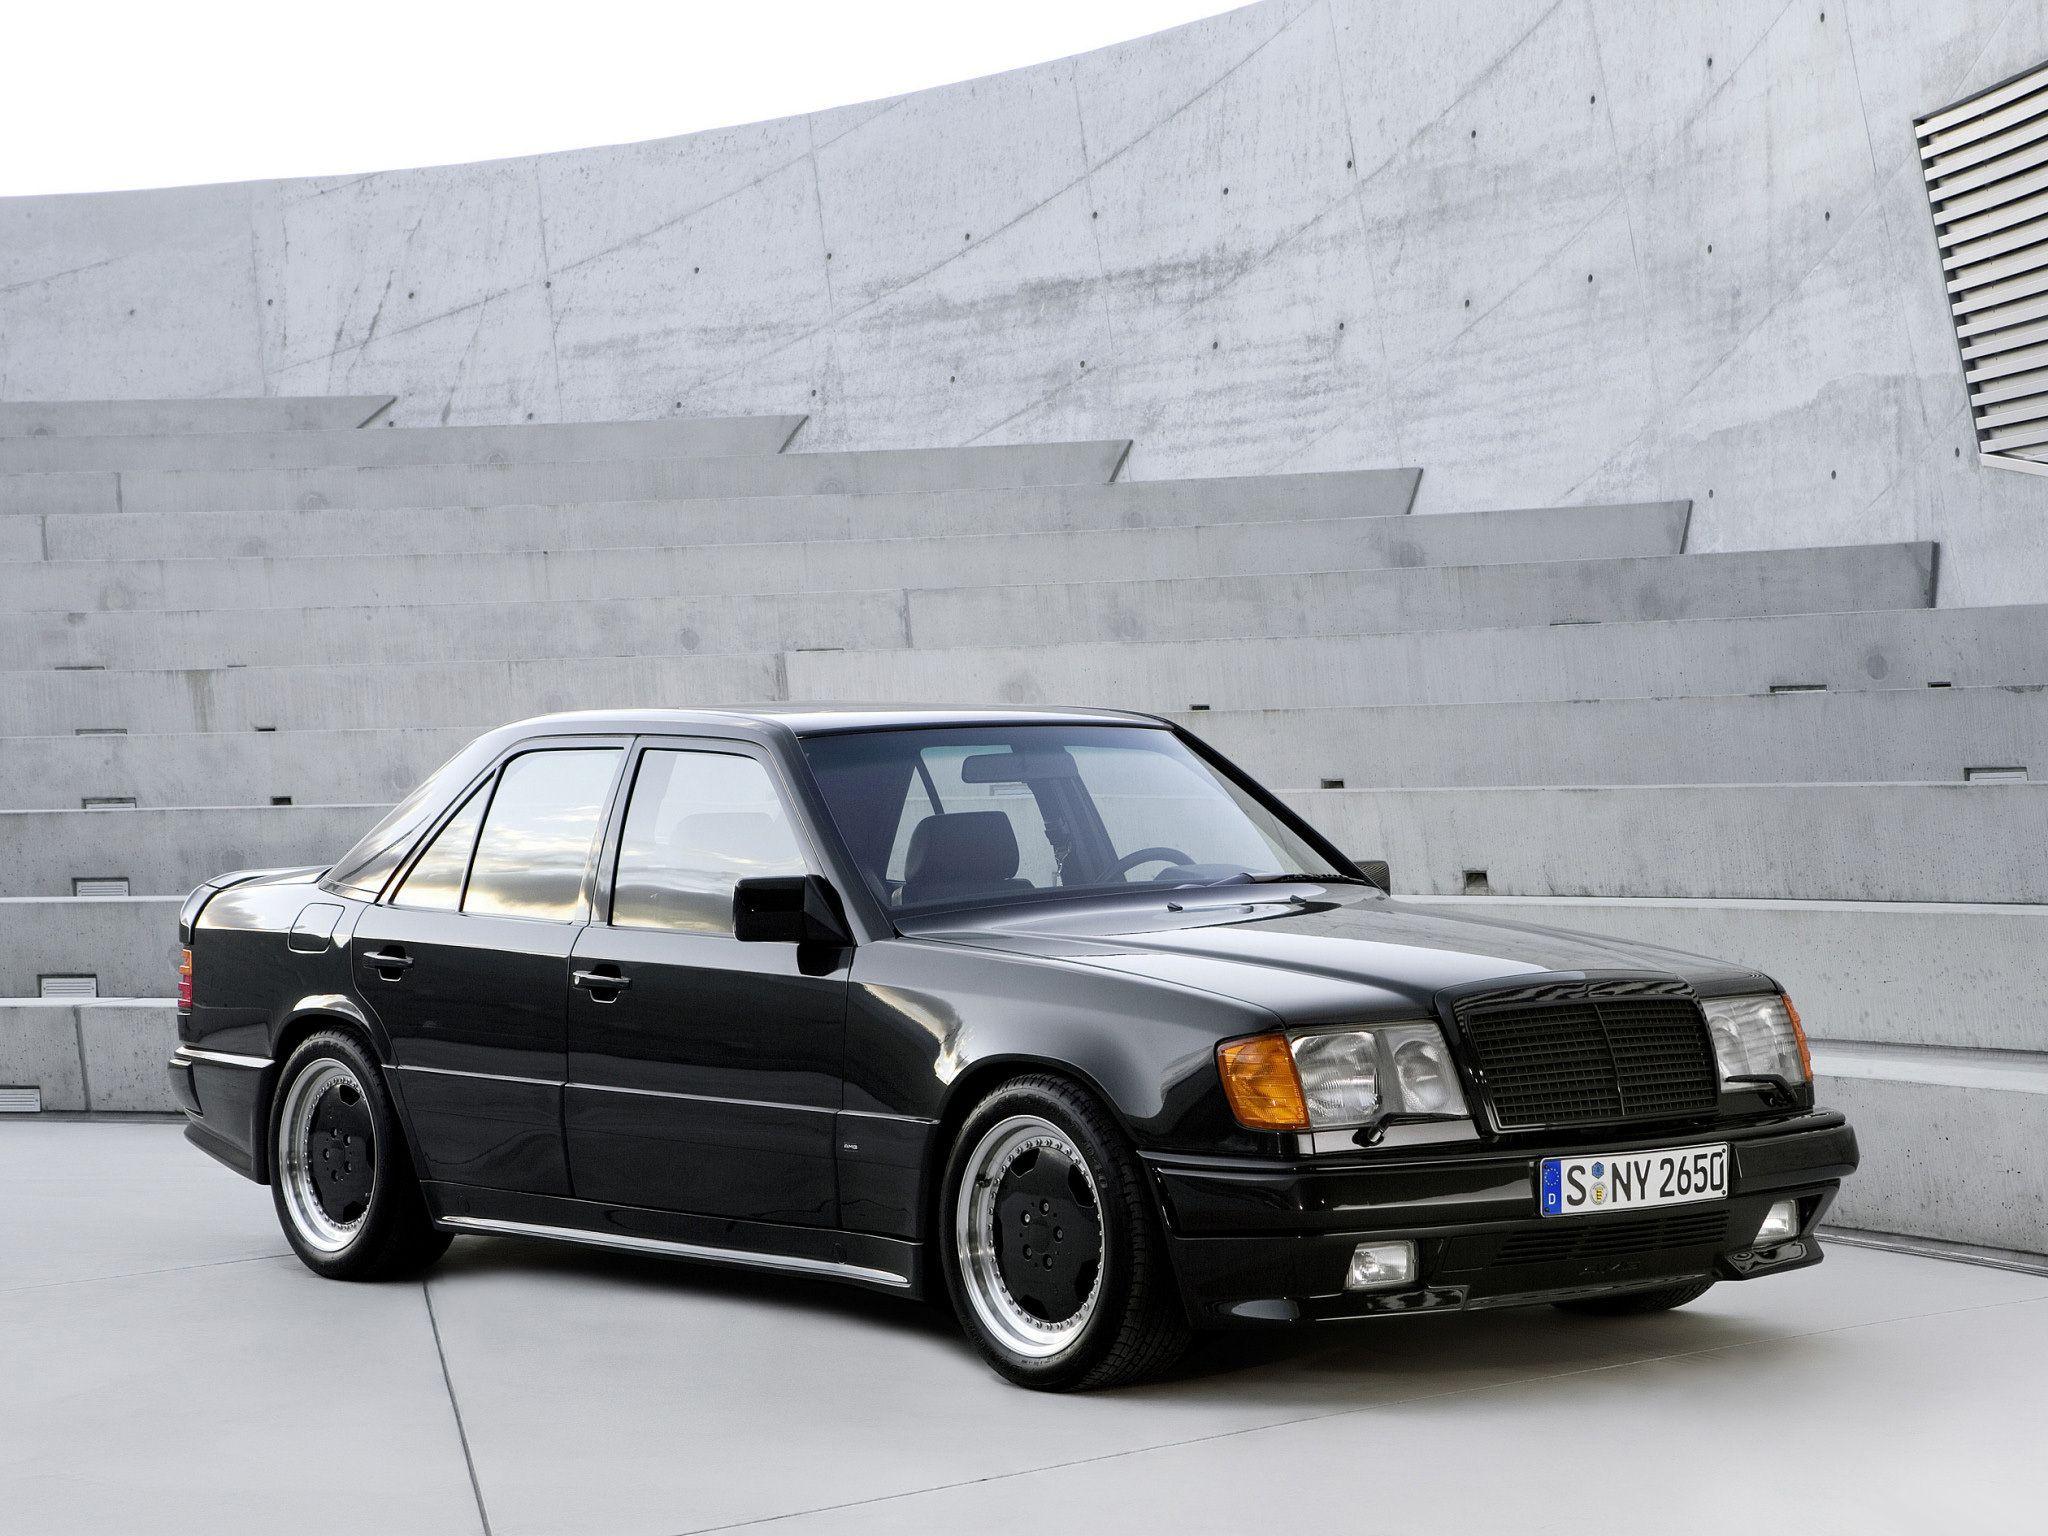 Ten insanely badass tuner cars | W124 | Mercedes benz cars